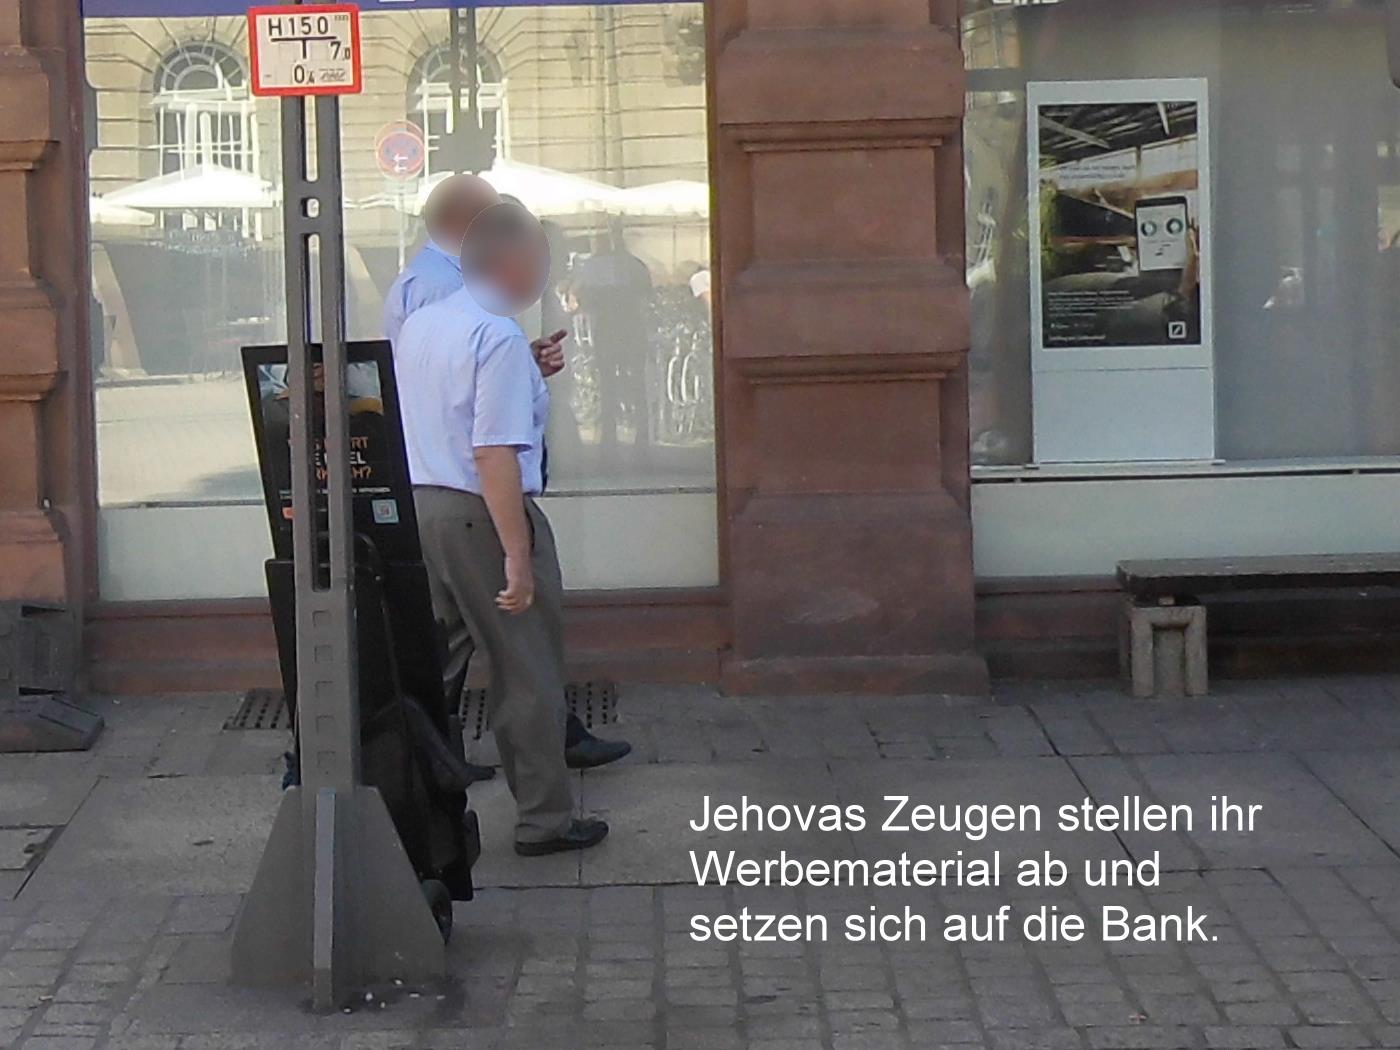 Jehovah's Witnesses in Speyer: Spider seeks flies